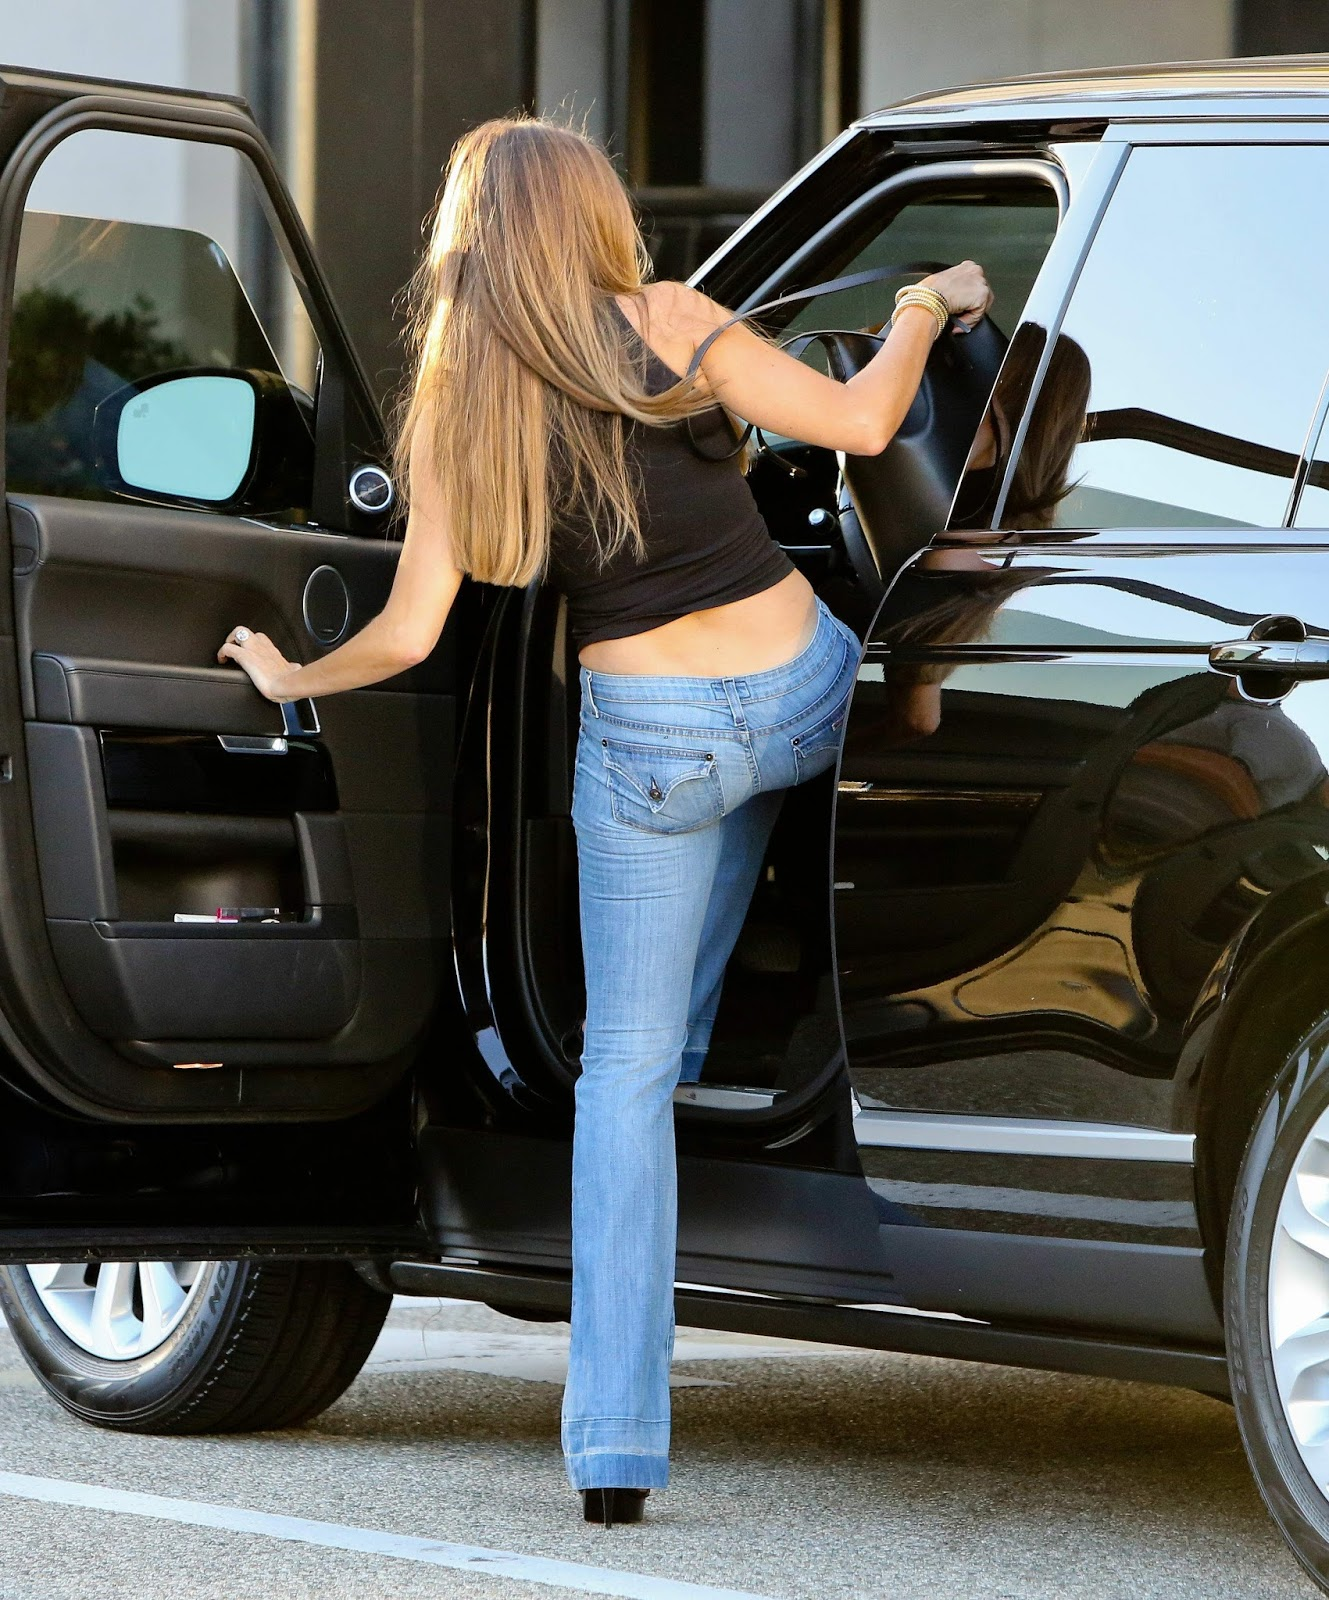 Sofia Vergara Nooty in Jeans